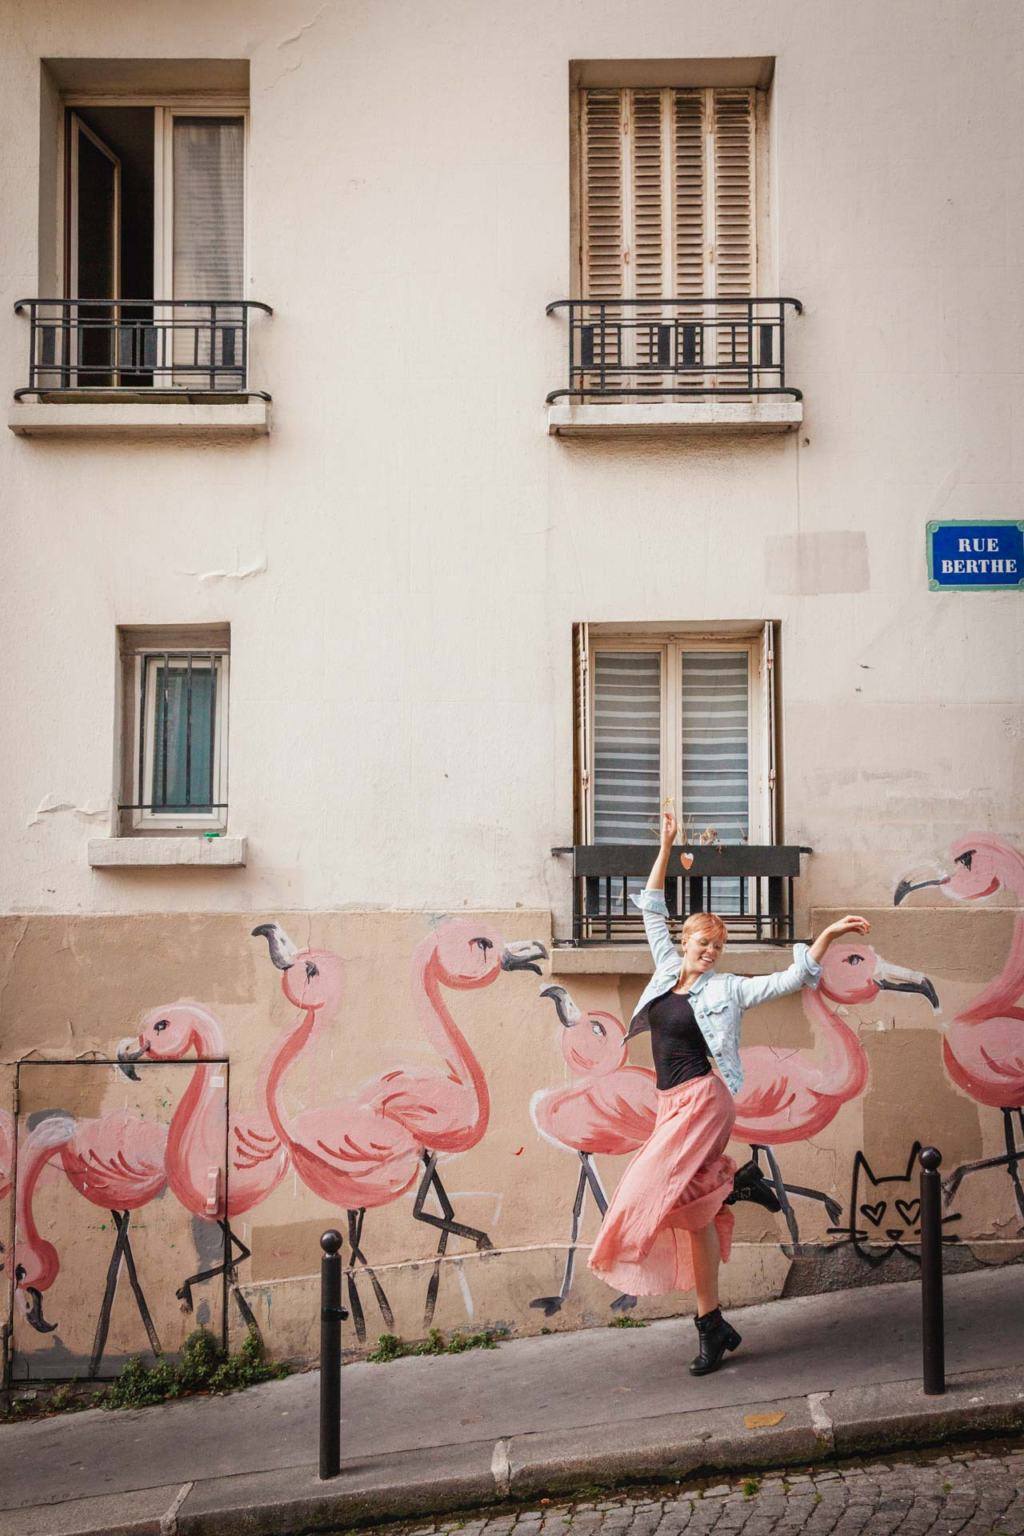 Flamingo Street Art, Montmartre, Rue Berthe, Paris